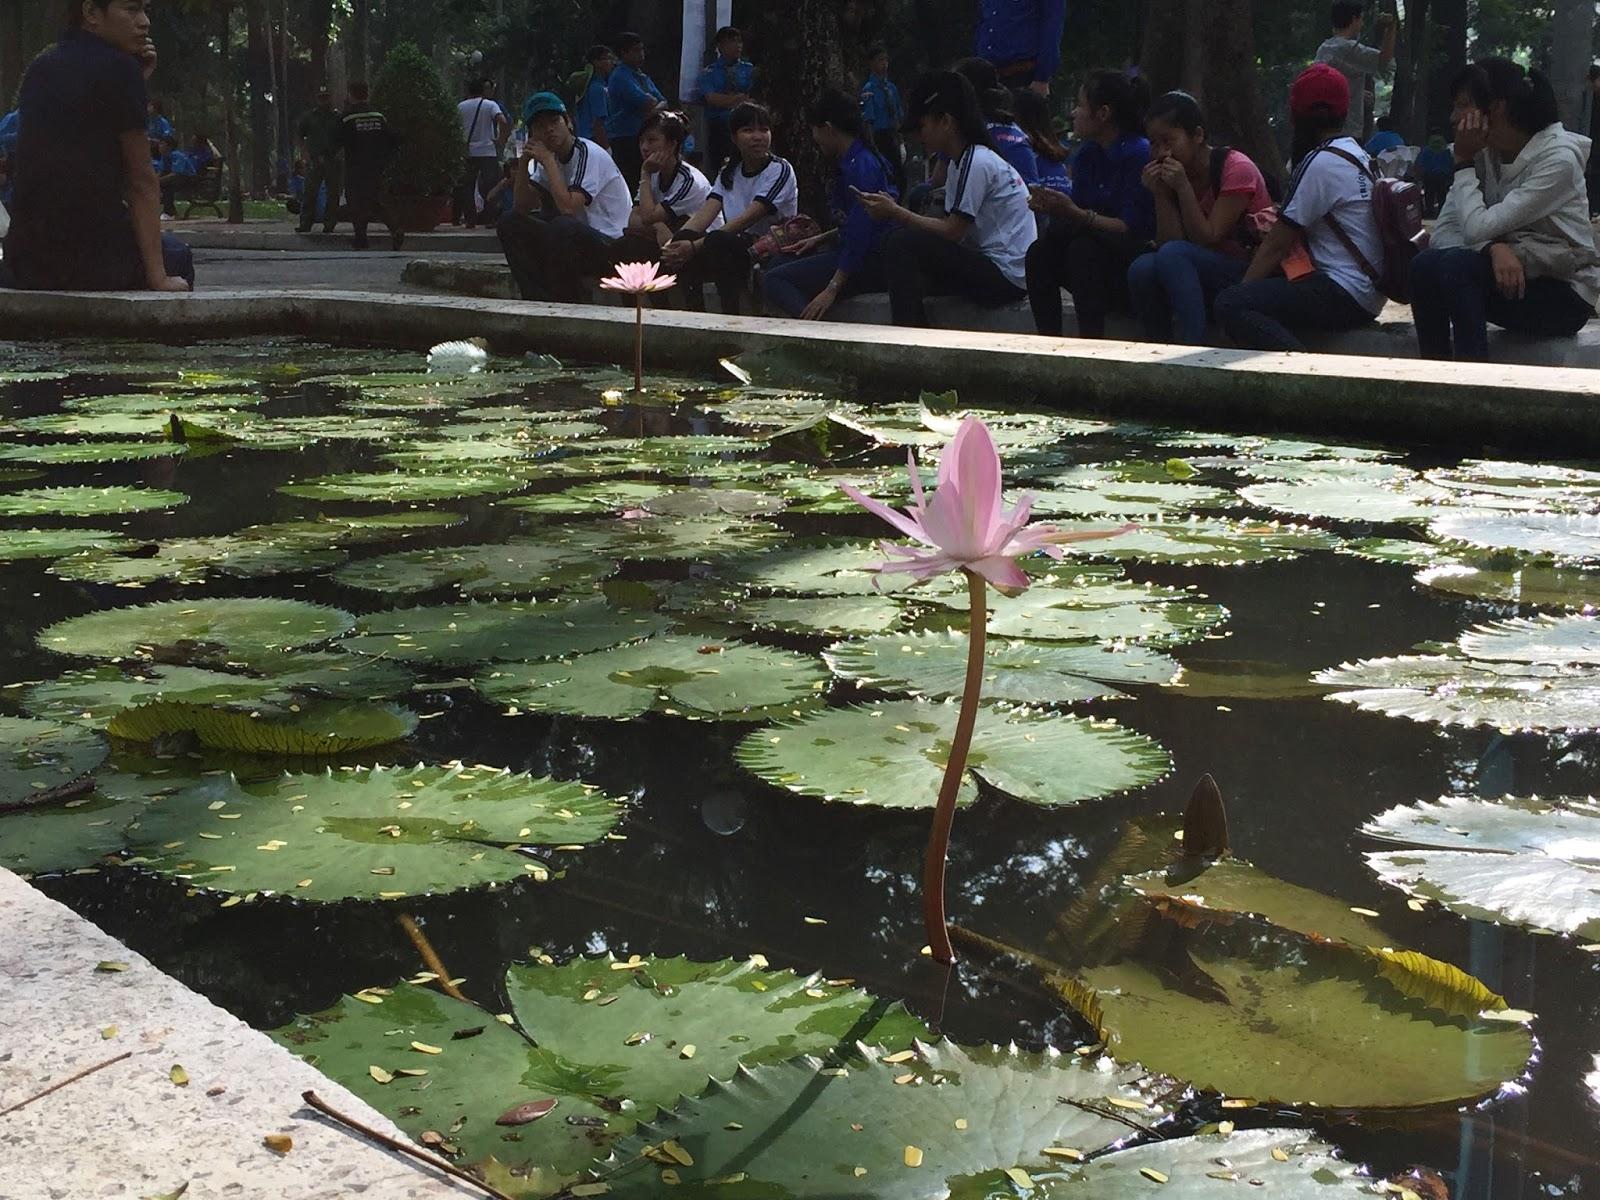 hcmc-vietnam-park ベトナムの公園2